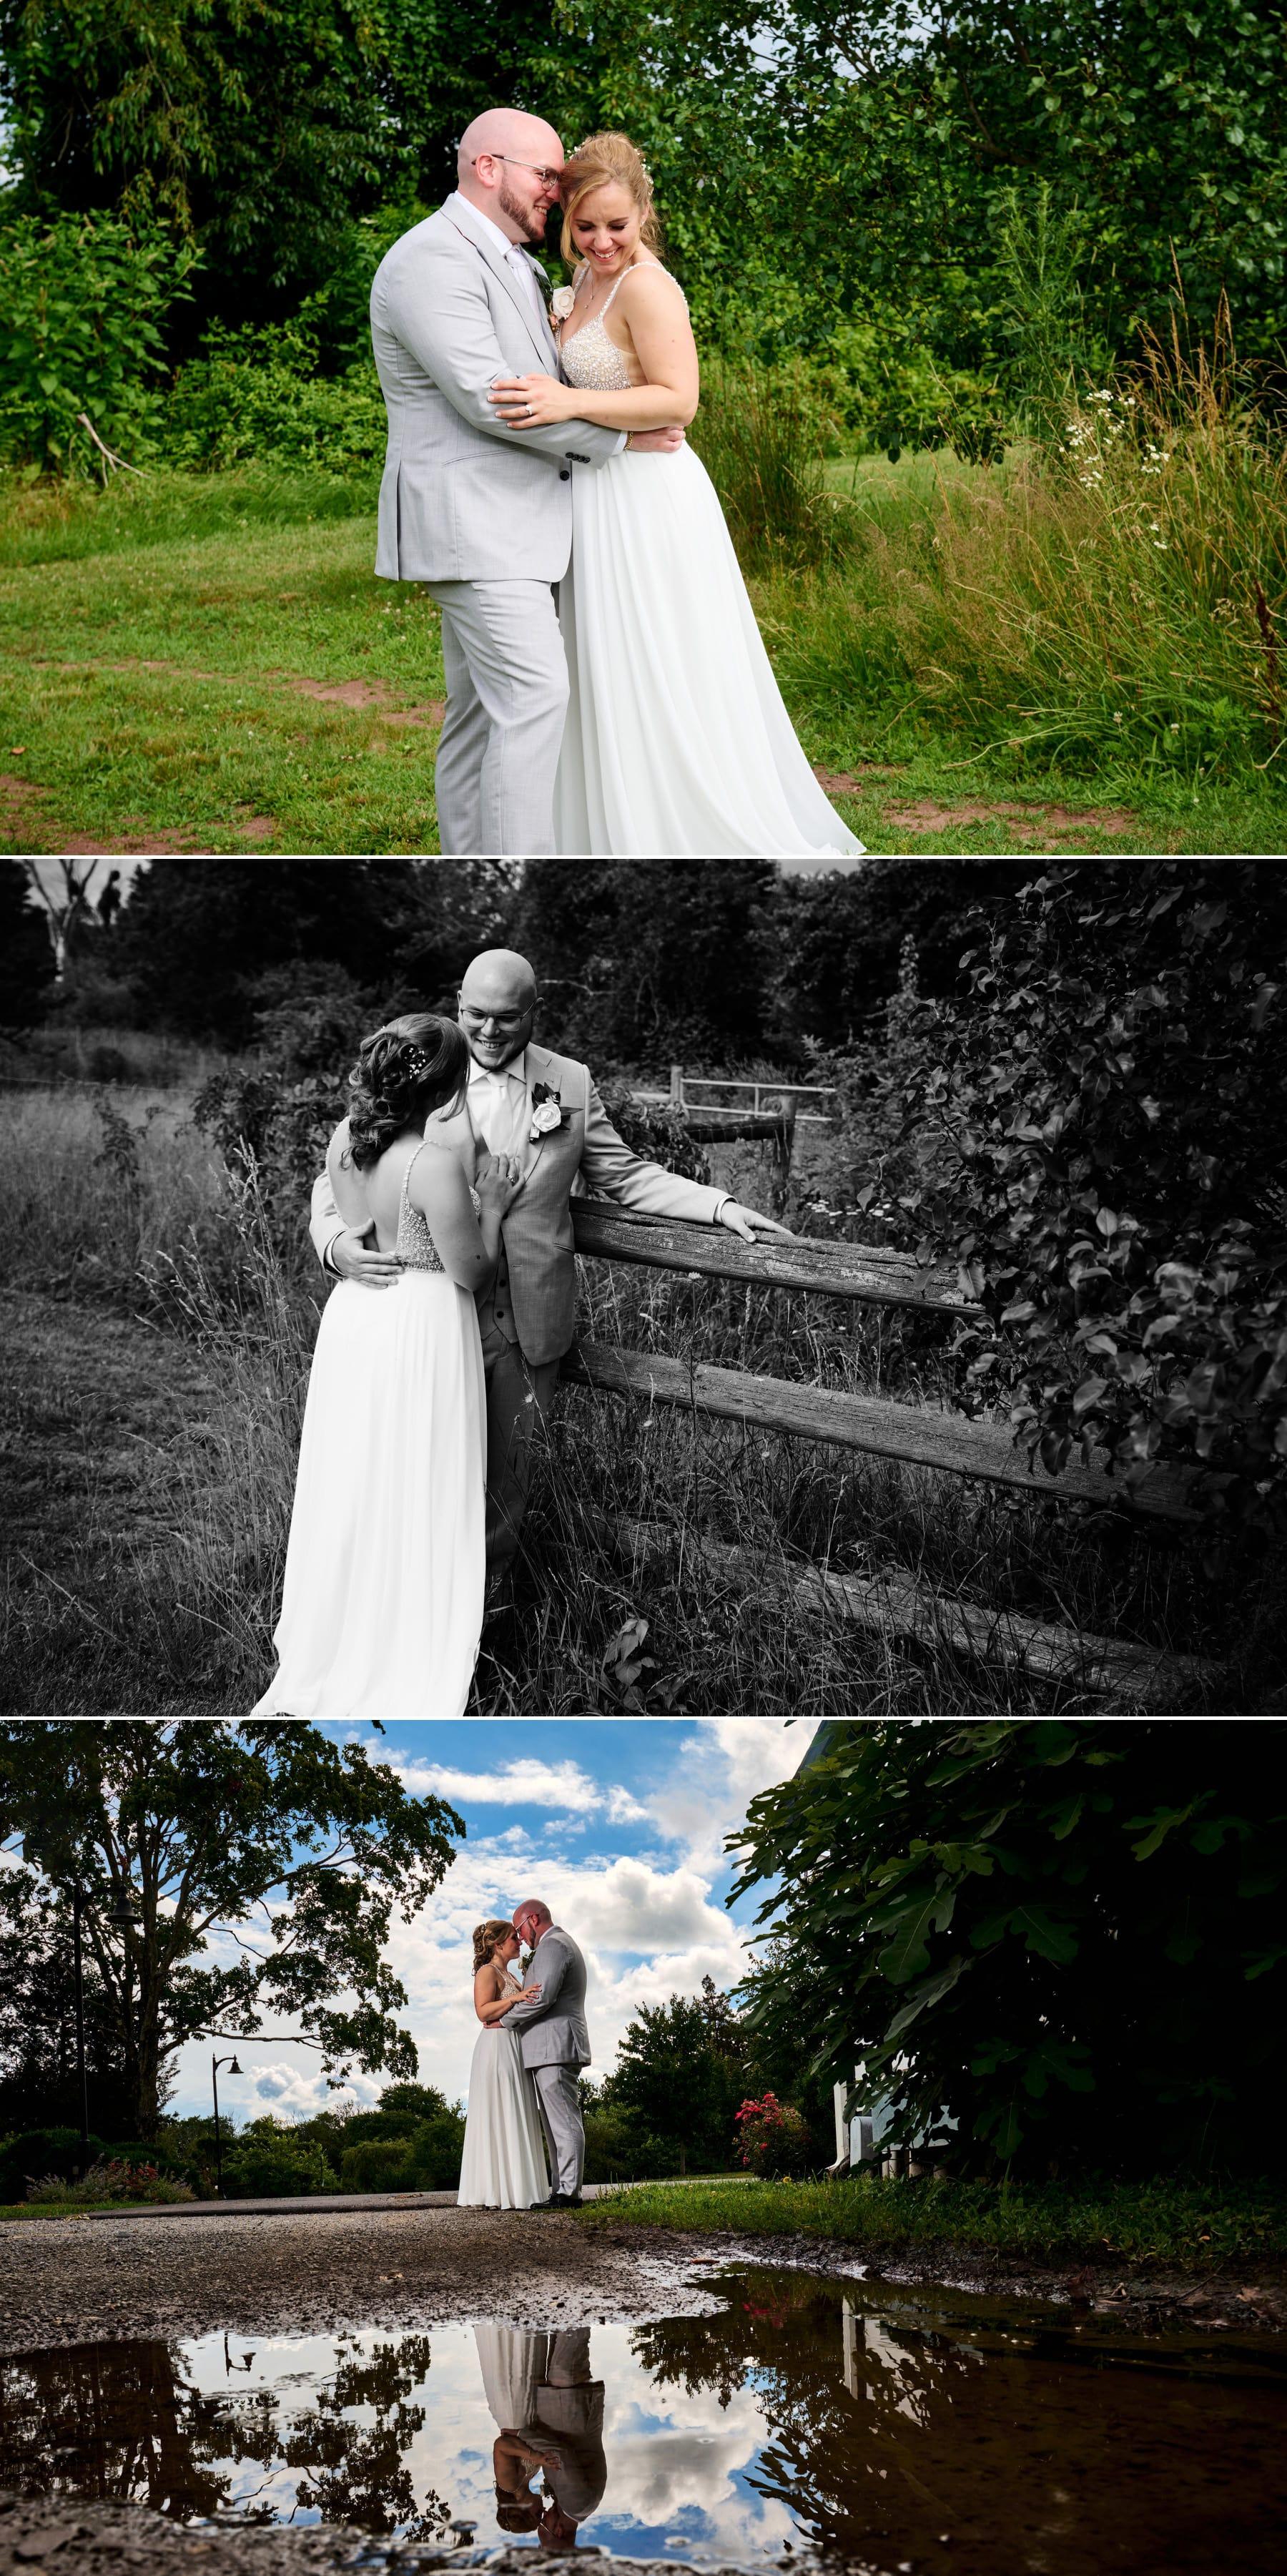 bride and groom wedding photos at Brick Farm Tavern